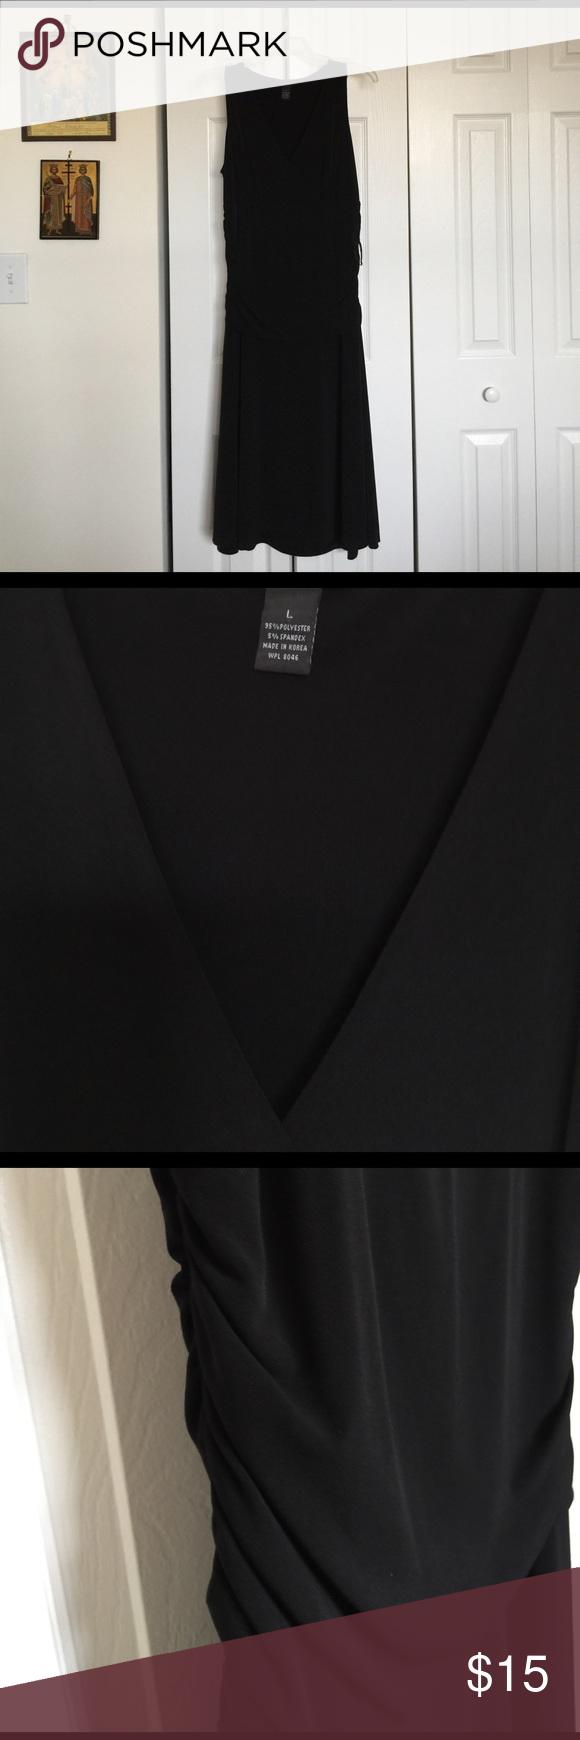 Classic Black V-neck sleeveless evening dress. Crossover V-neck; gathered sides pull over dress. 95% Polyester 5% Spandex Alfani Dresses Midi